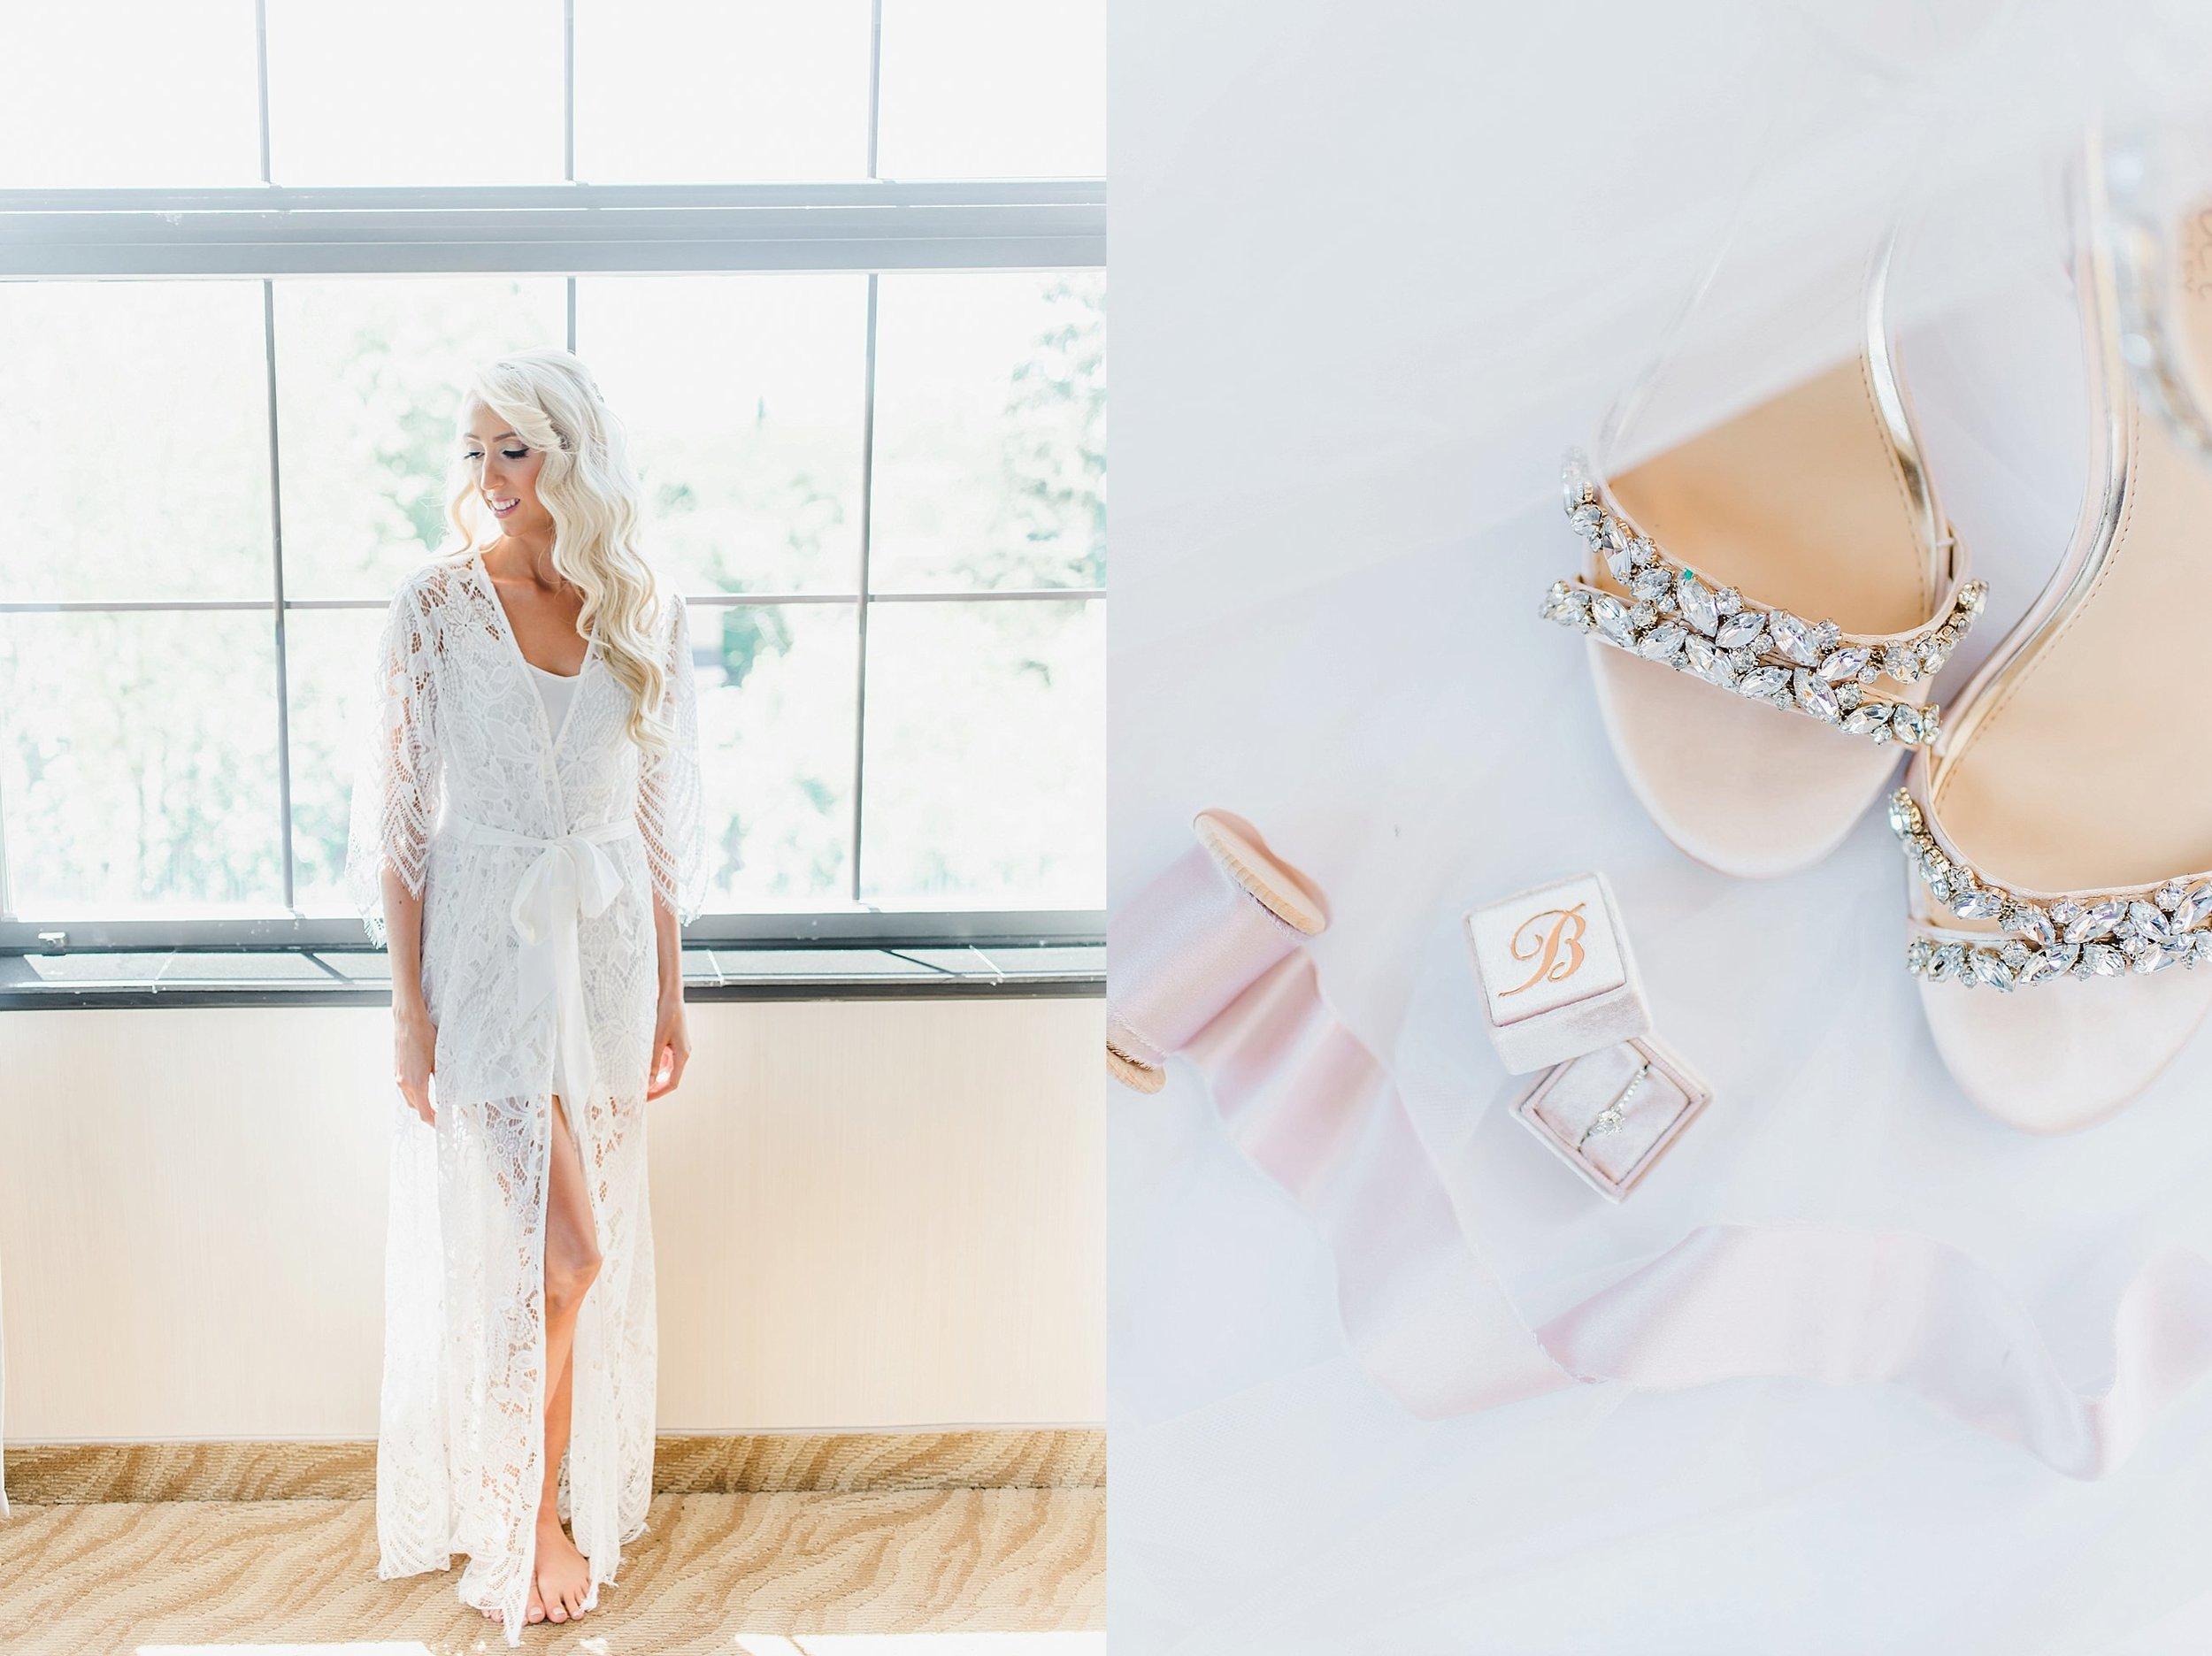 light airy indie fine art ottawa wedding photographer | Ali and Batoul Photography_0020.jpg